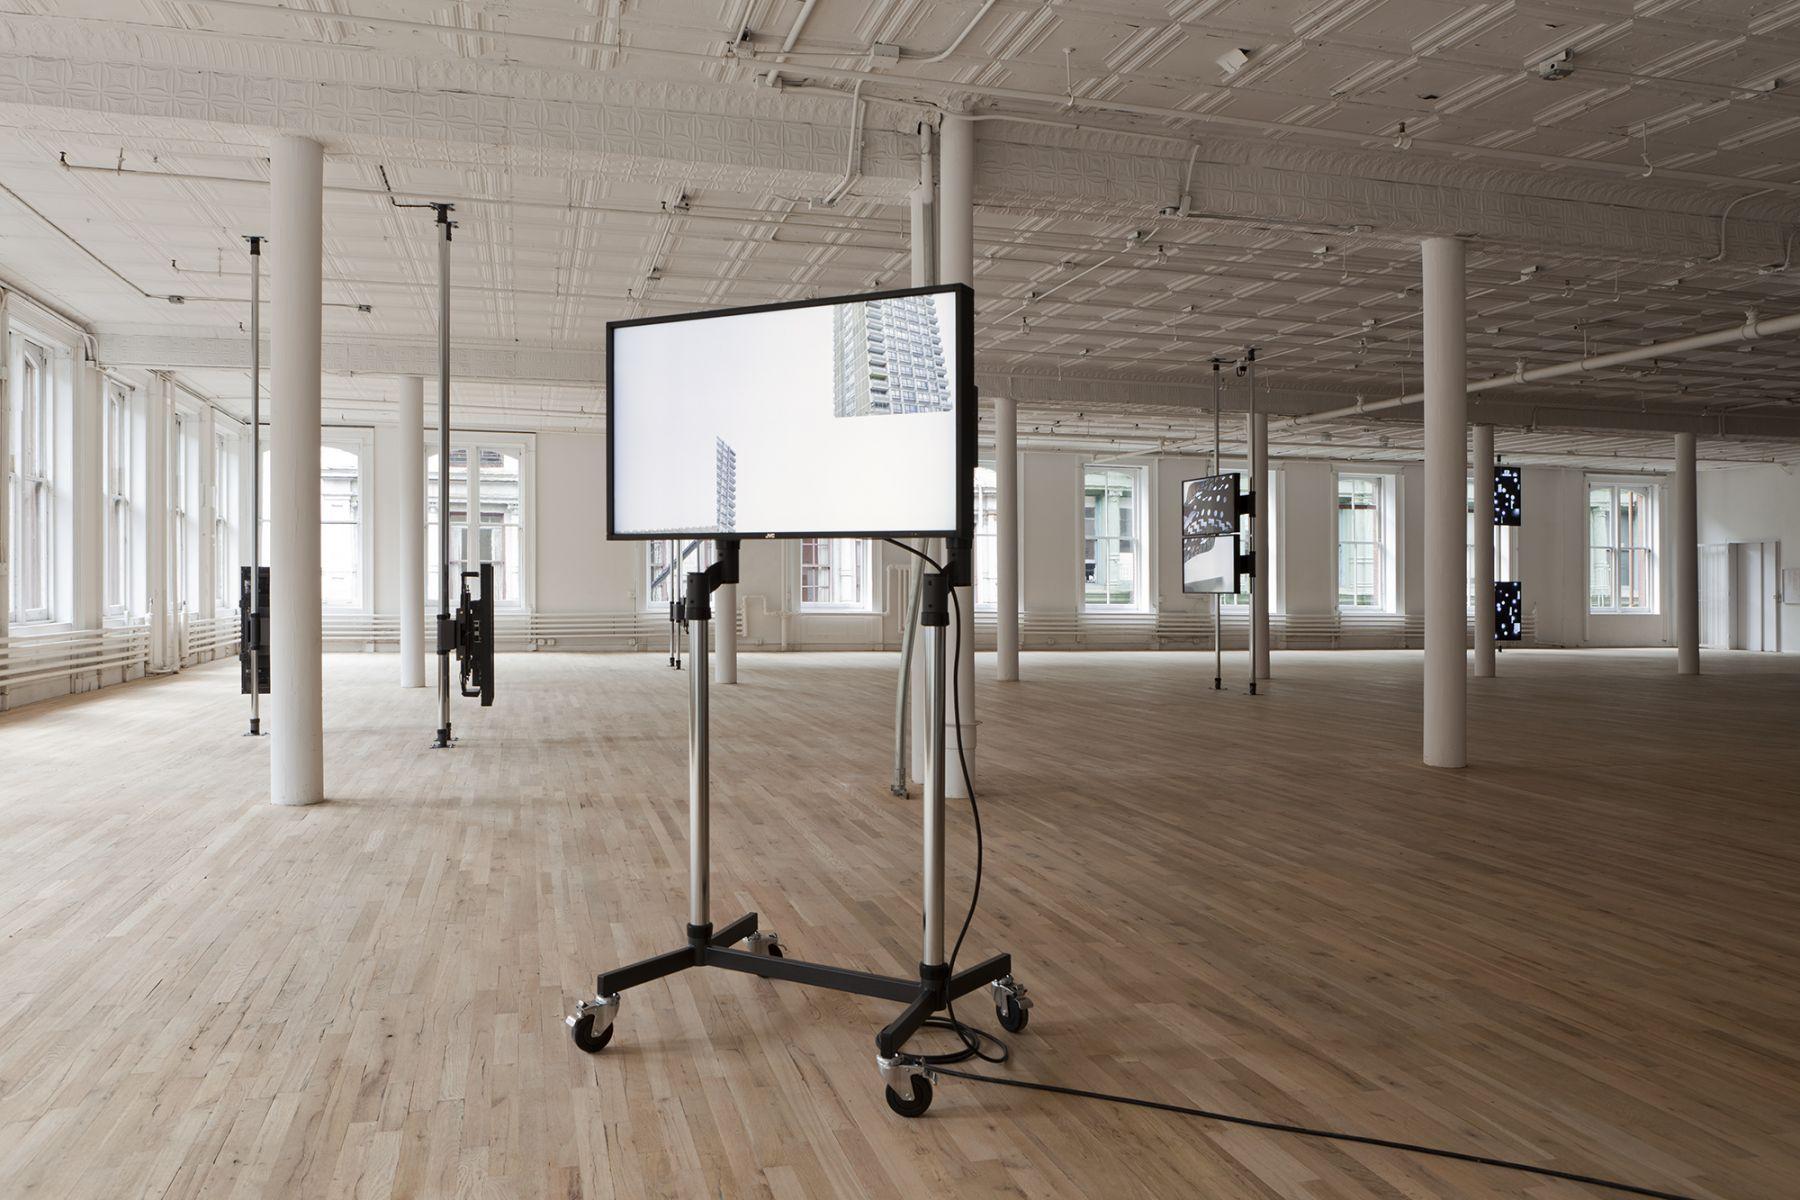 Installation view, Hilary Lloyd, Artists Space, New York, 2011